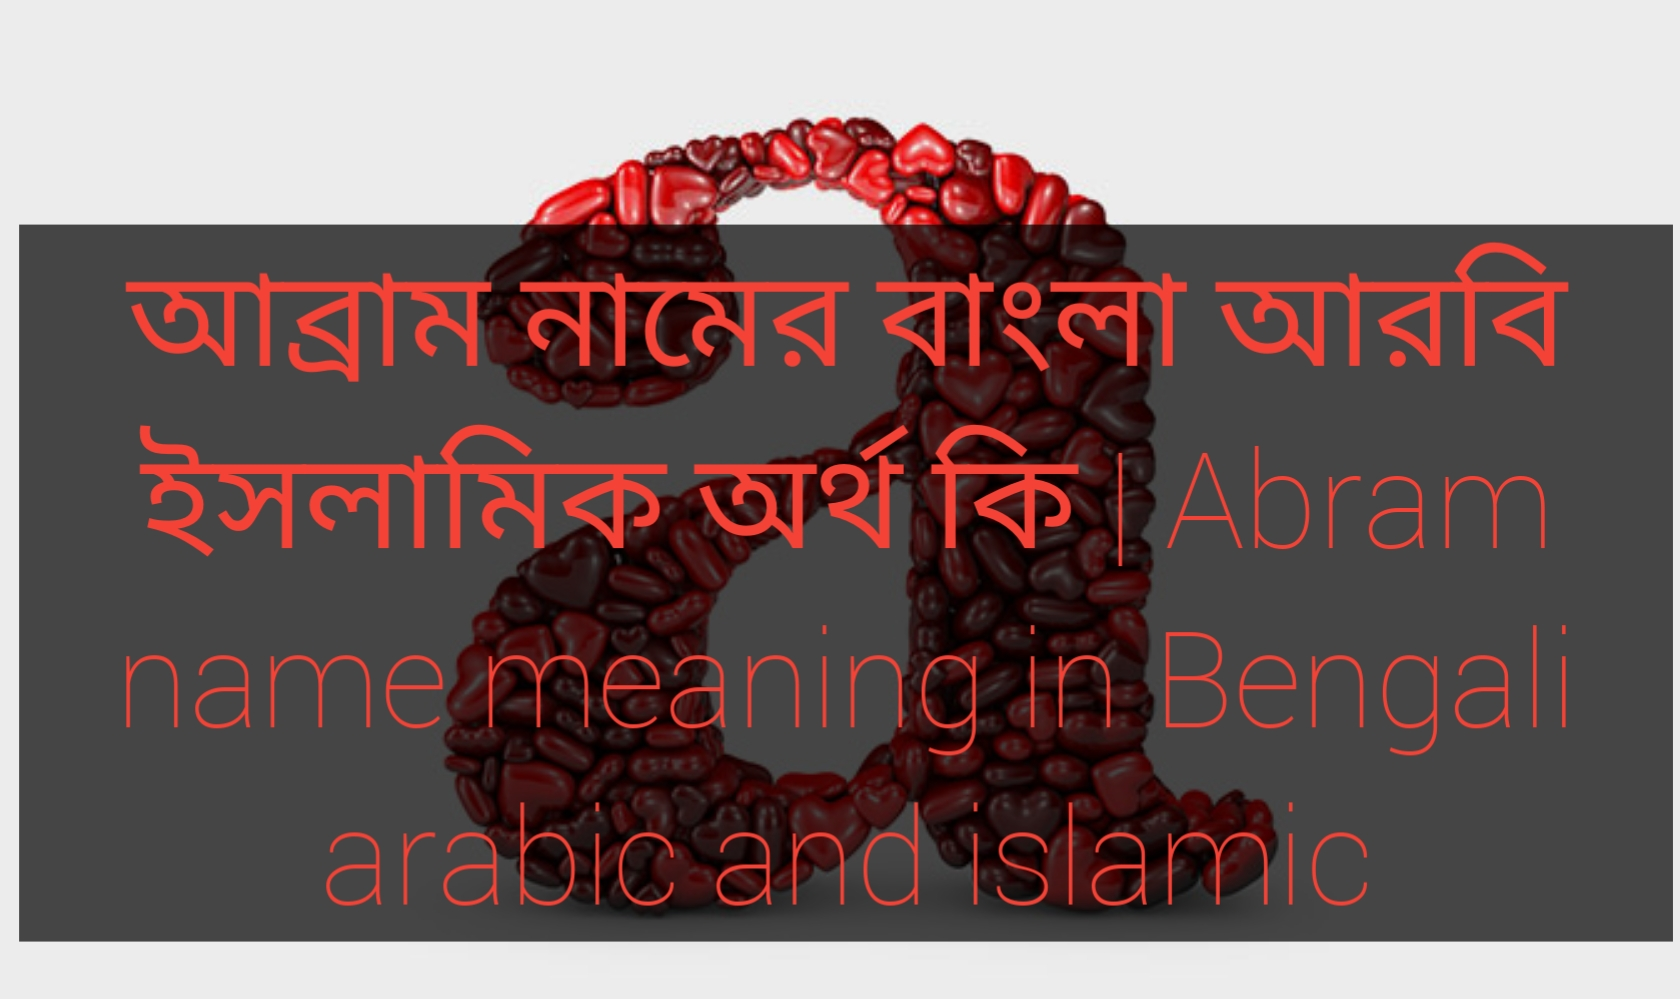 abram name meaning in Bengali, আব্রাম নামের অর্থ কি, আব্রাম নামের বাংলা অর্থ কি, আব্রাম নামের ইসলামিক অর্থ কি,